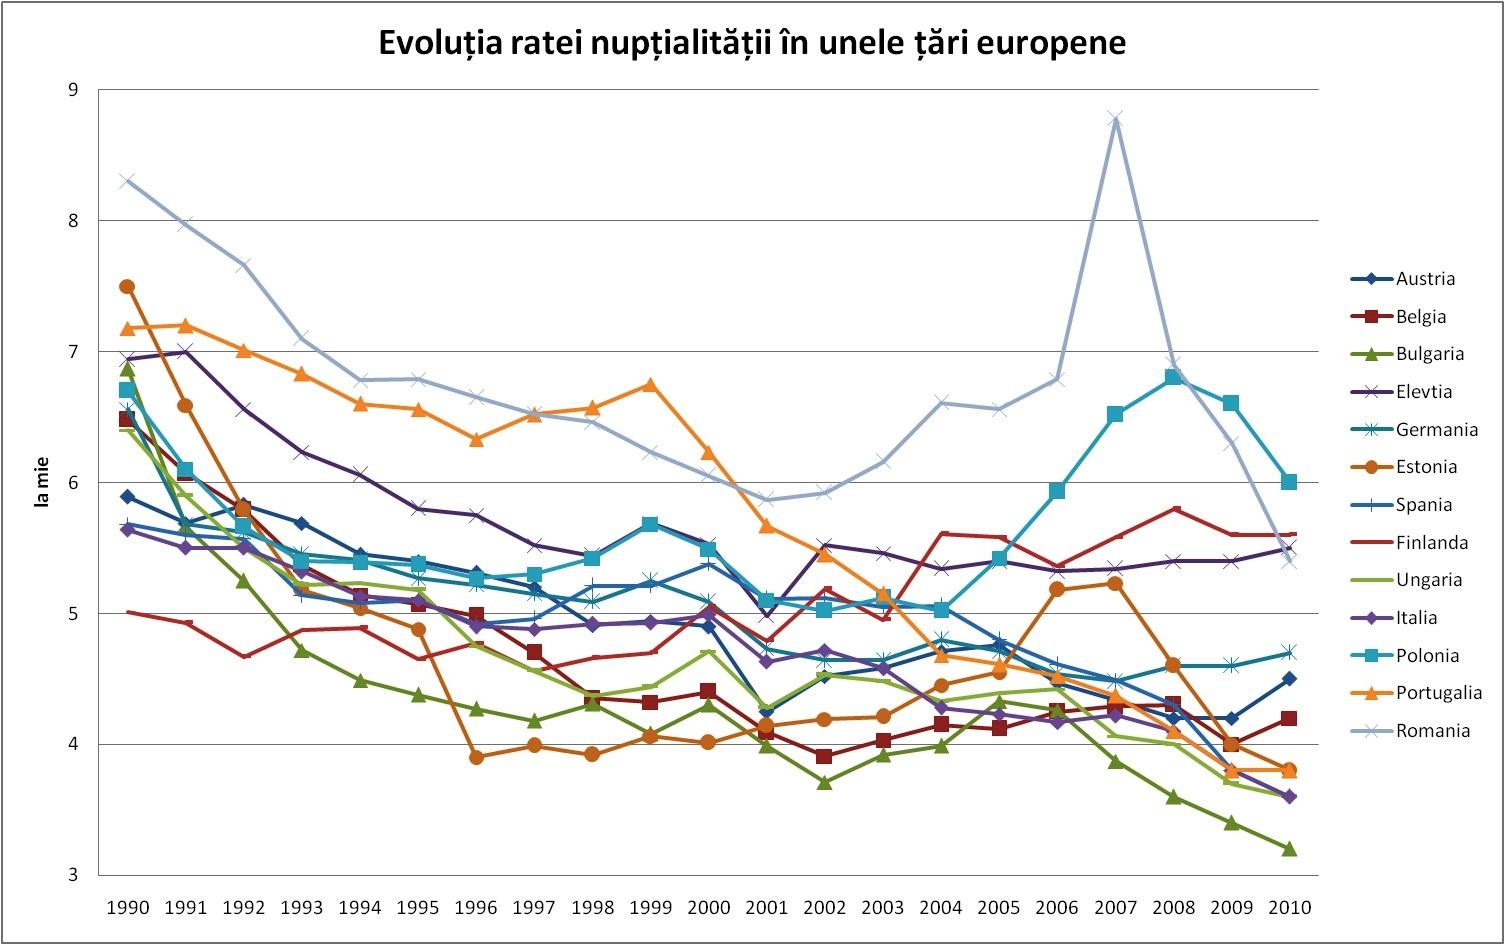 RataNupt Europa_14203_image001